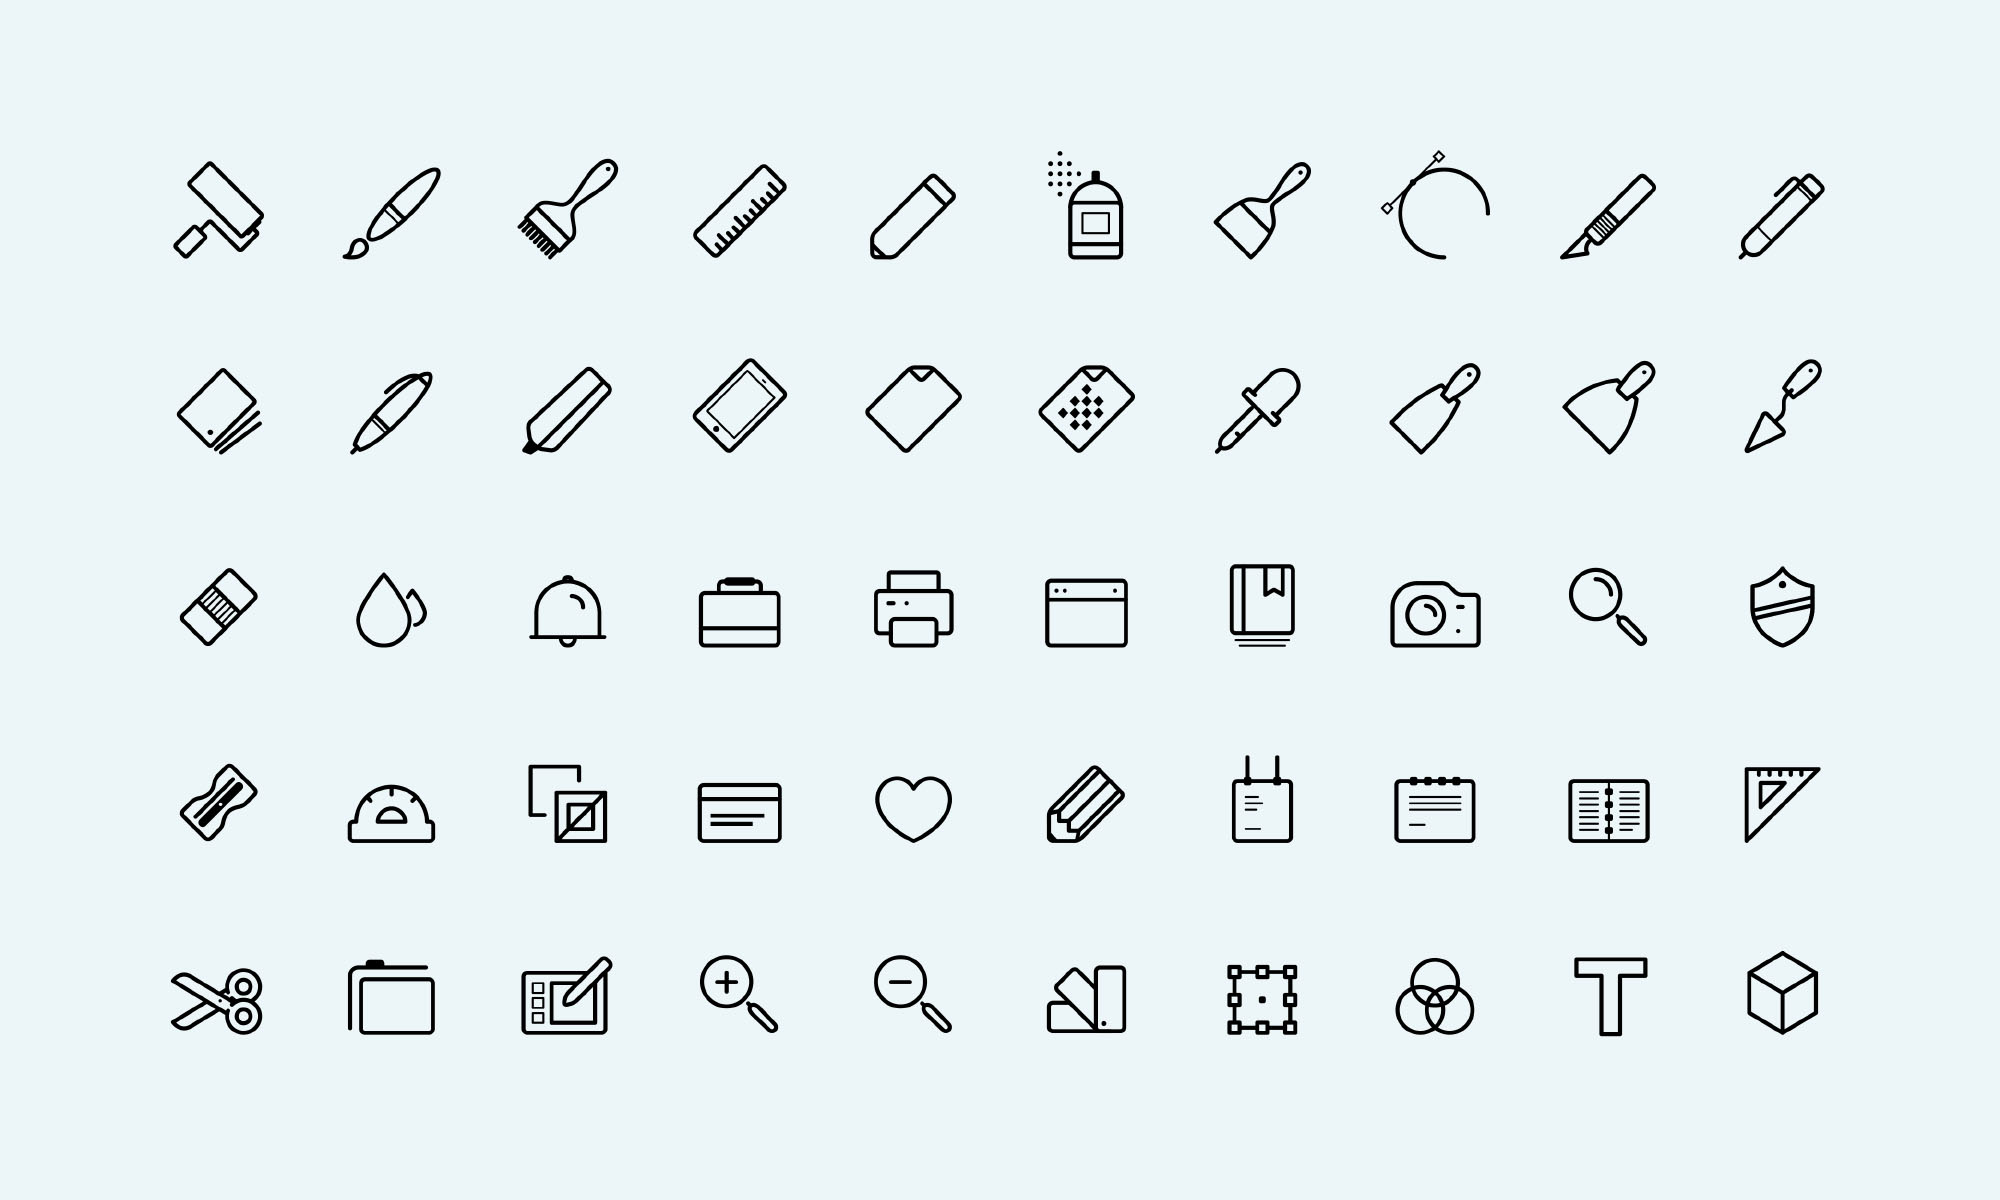 50 Free Art Icons